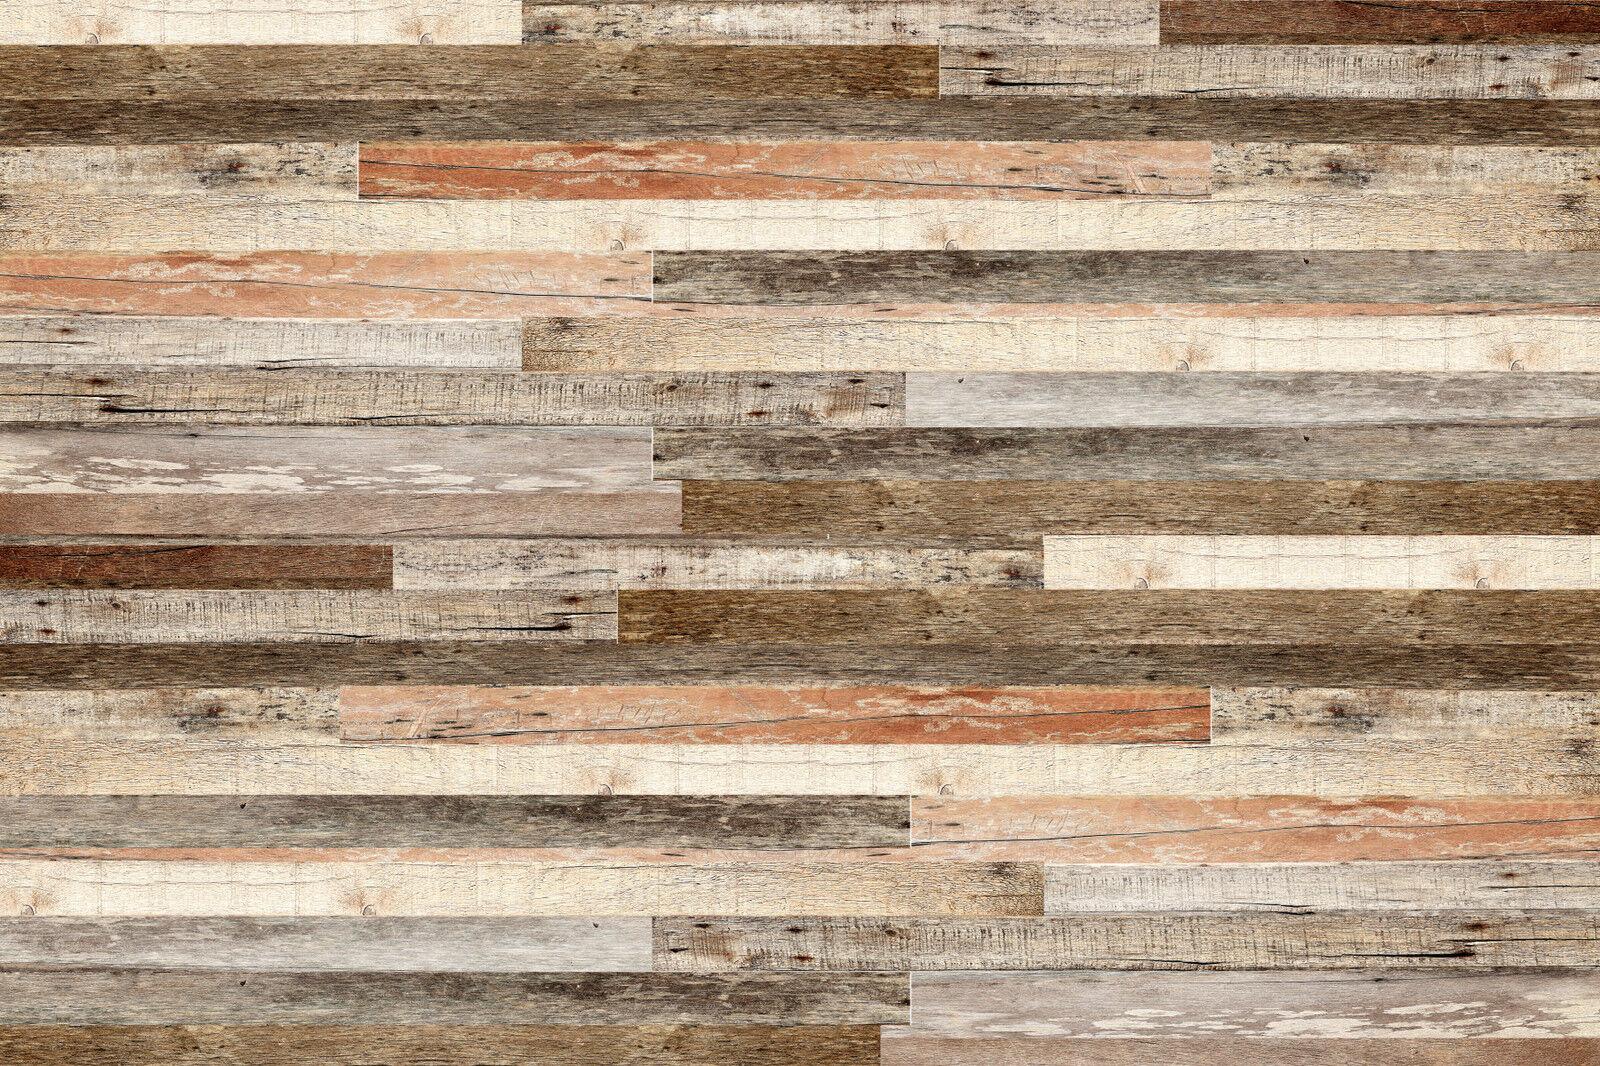 NON-WOVEN Photo Wallpaper (66V) -WOODEN WALL-350cmx260cm 7 strips Mural Wood